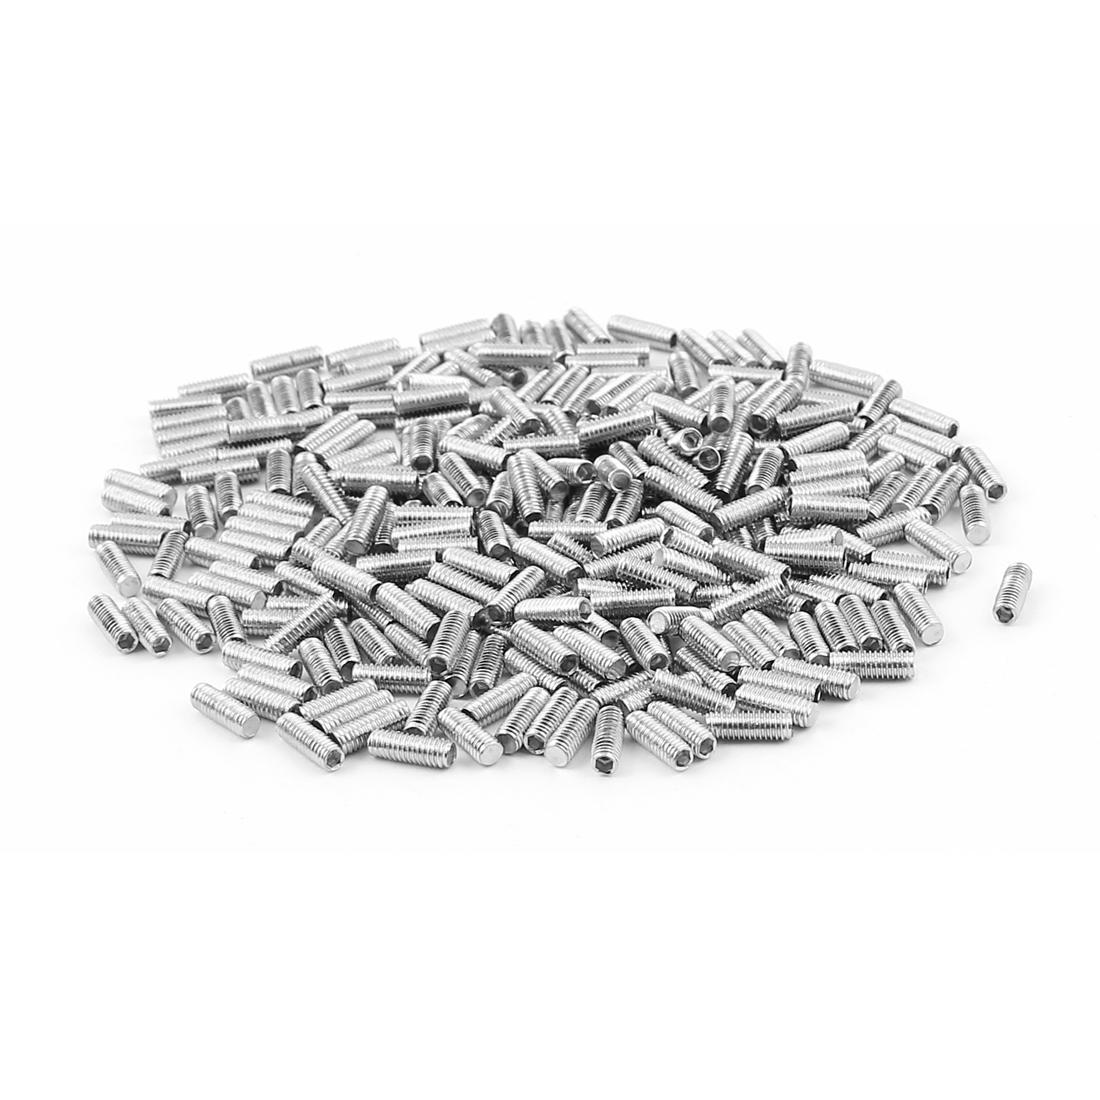 300pcs Stainless Steel M3x8mm Hexagonal Drive Flat Point Set Grub Screws